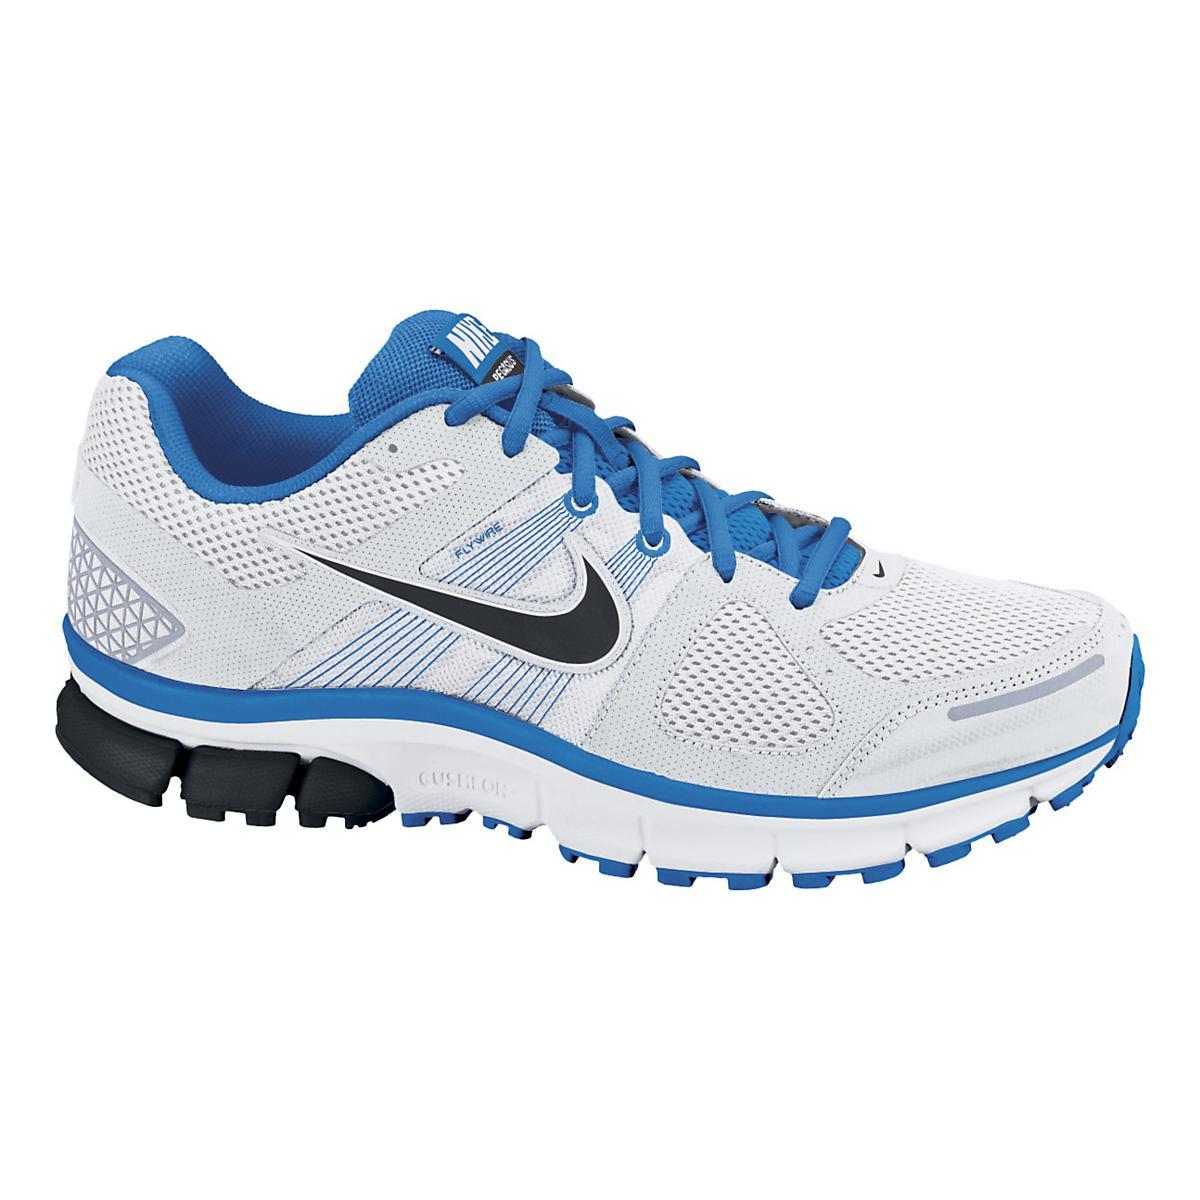 Huérfano brumoso no pueden ver  Mens Nike Air Pegasus+ 28 Running Shoe at Road Runner Sports